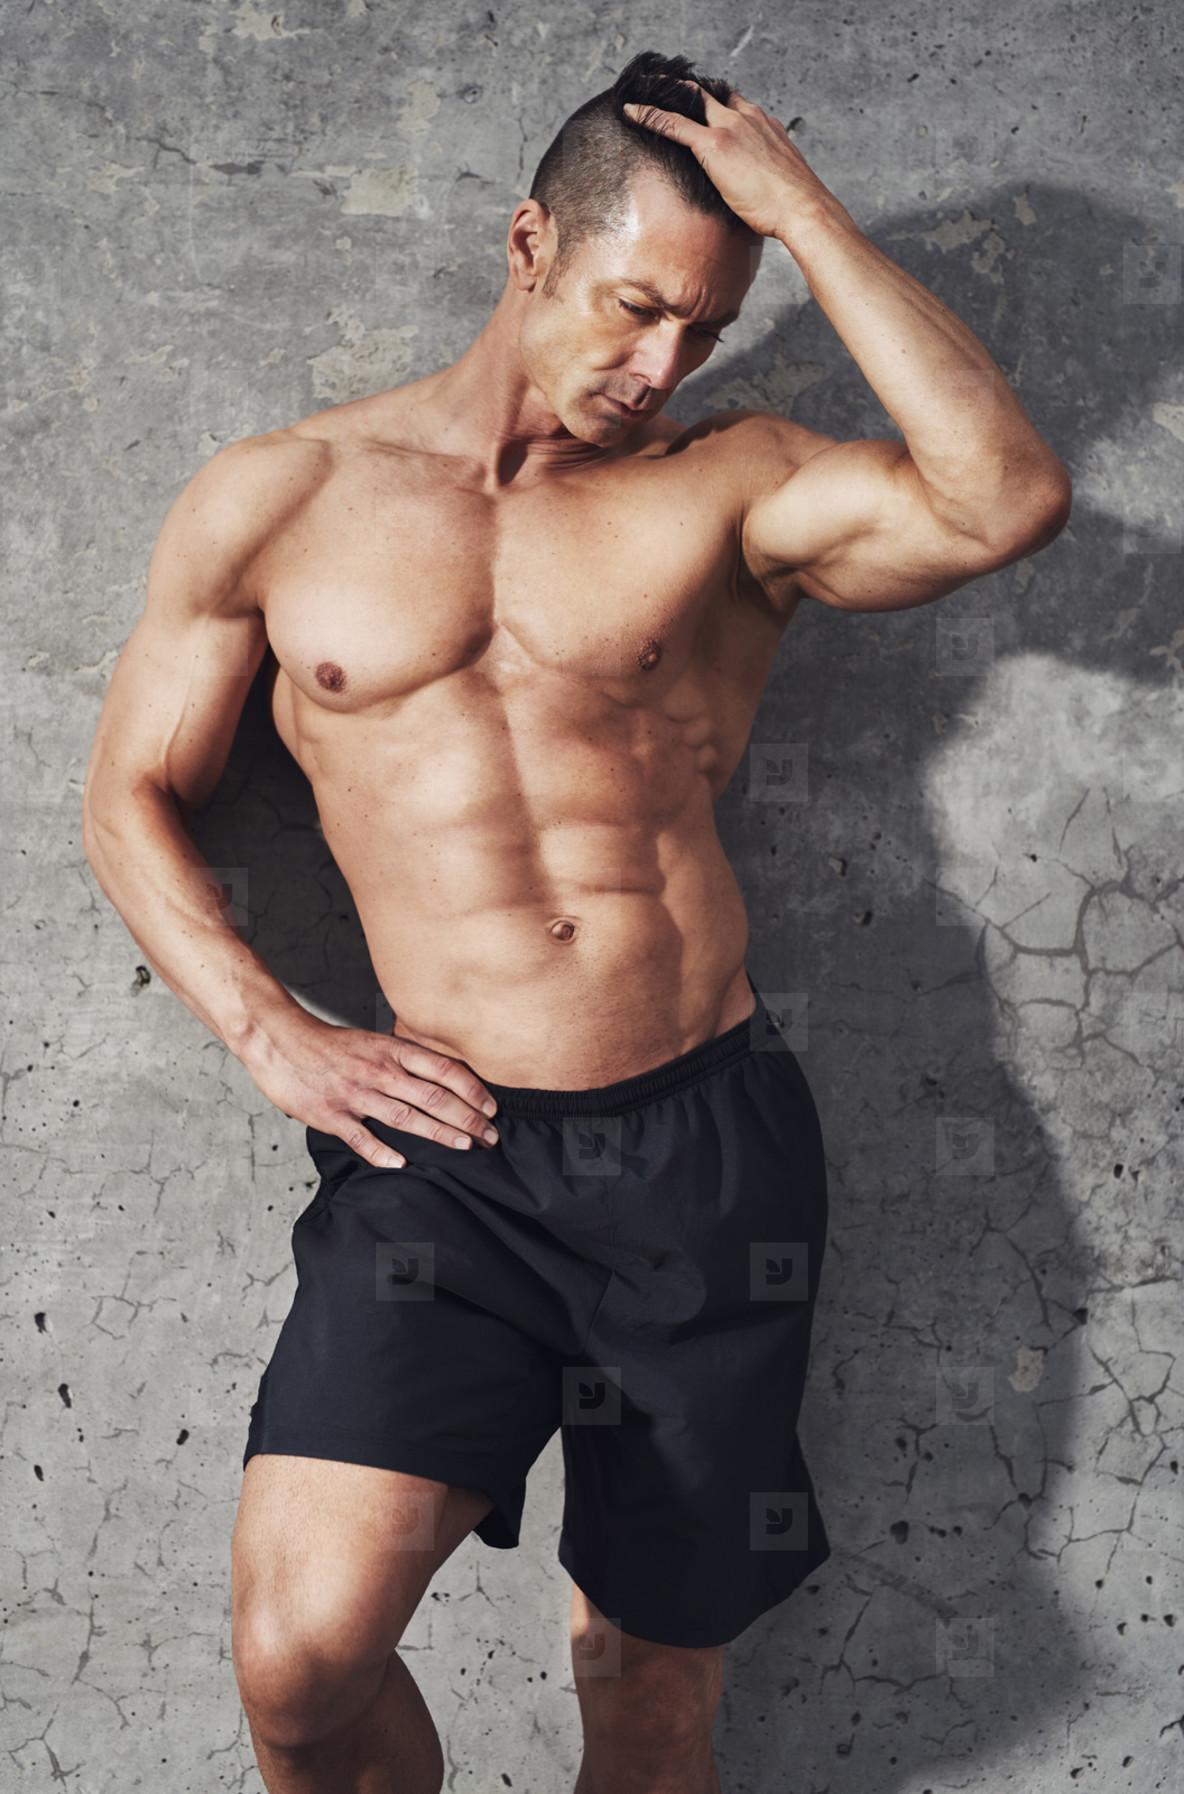 Fitness model portrait muscular build man relaxing